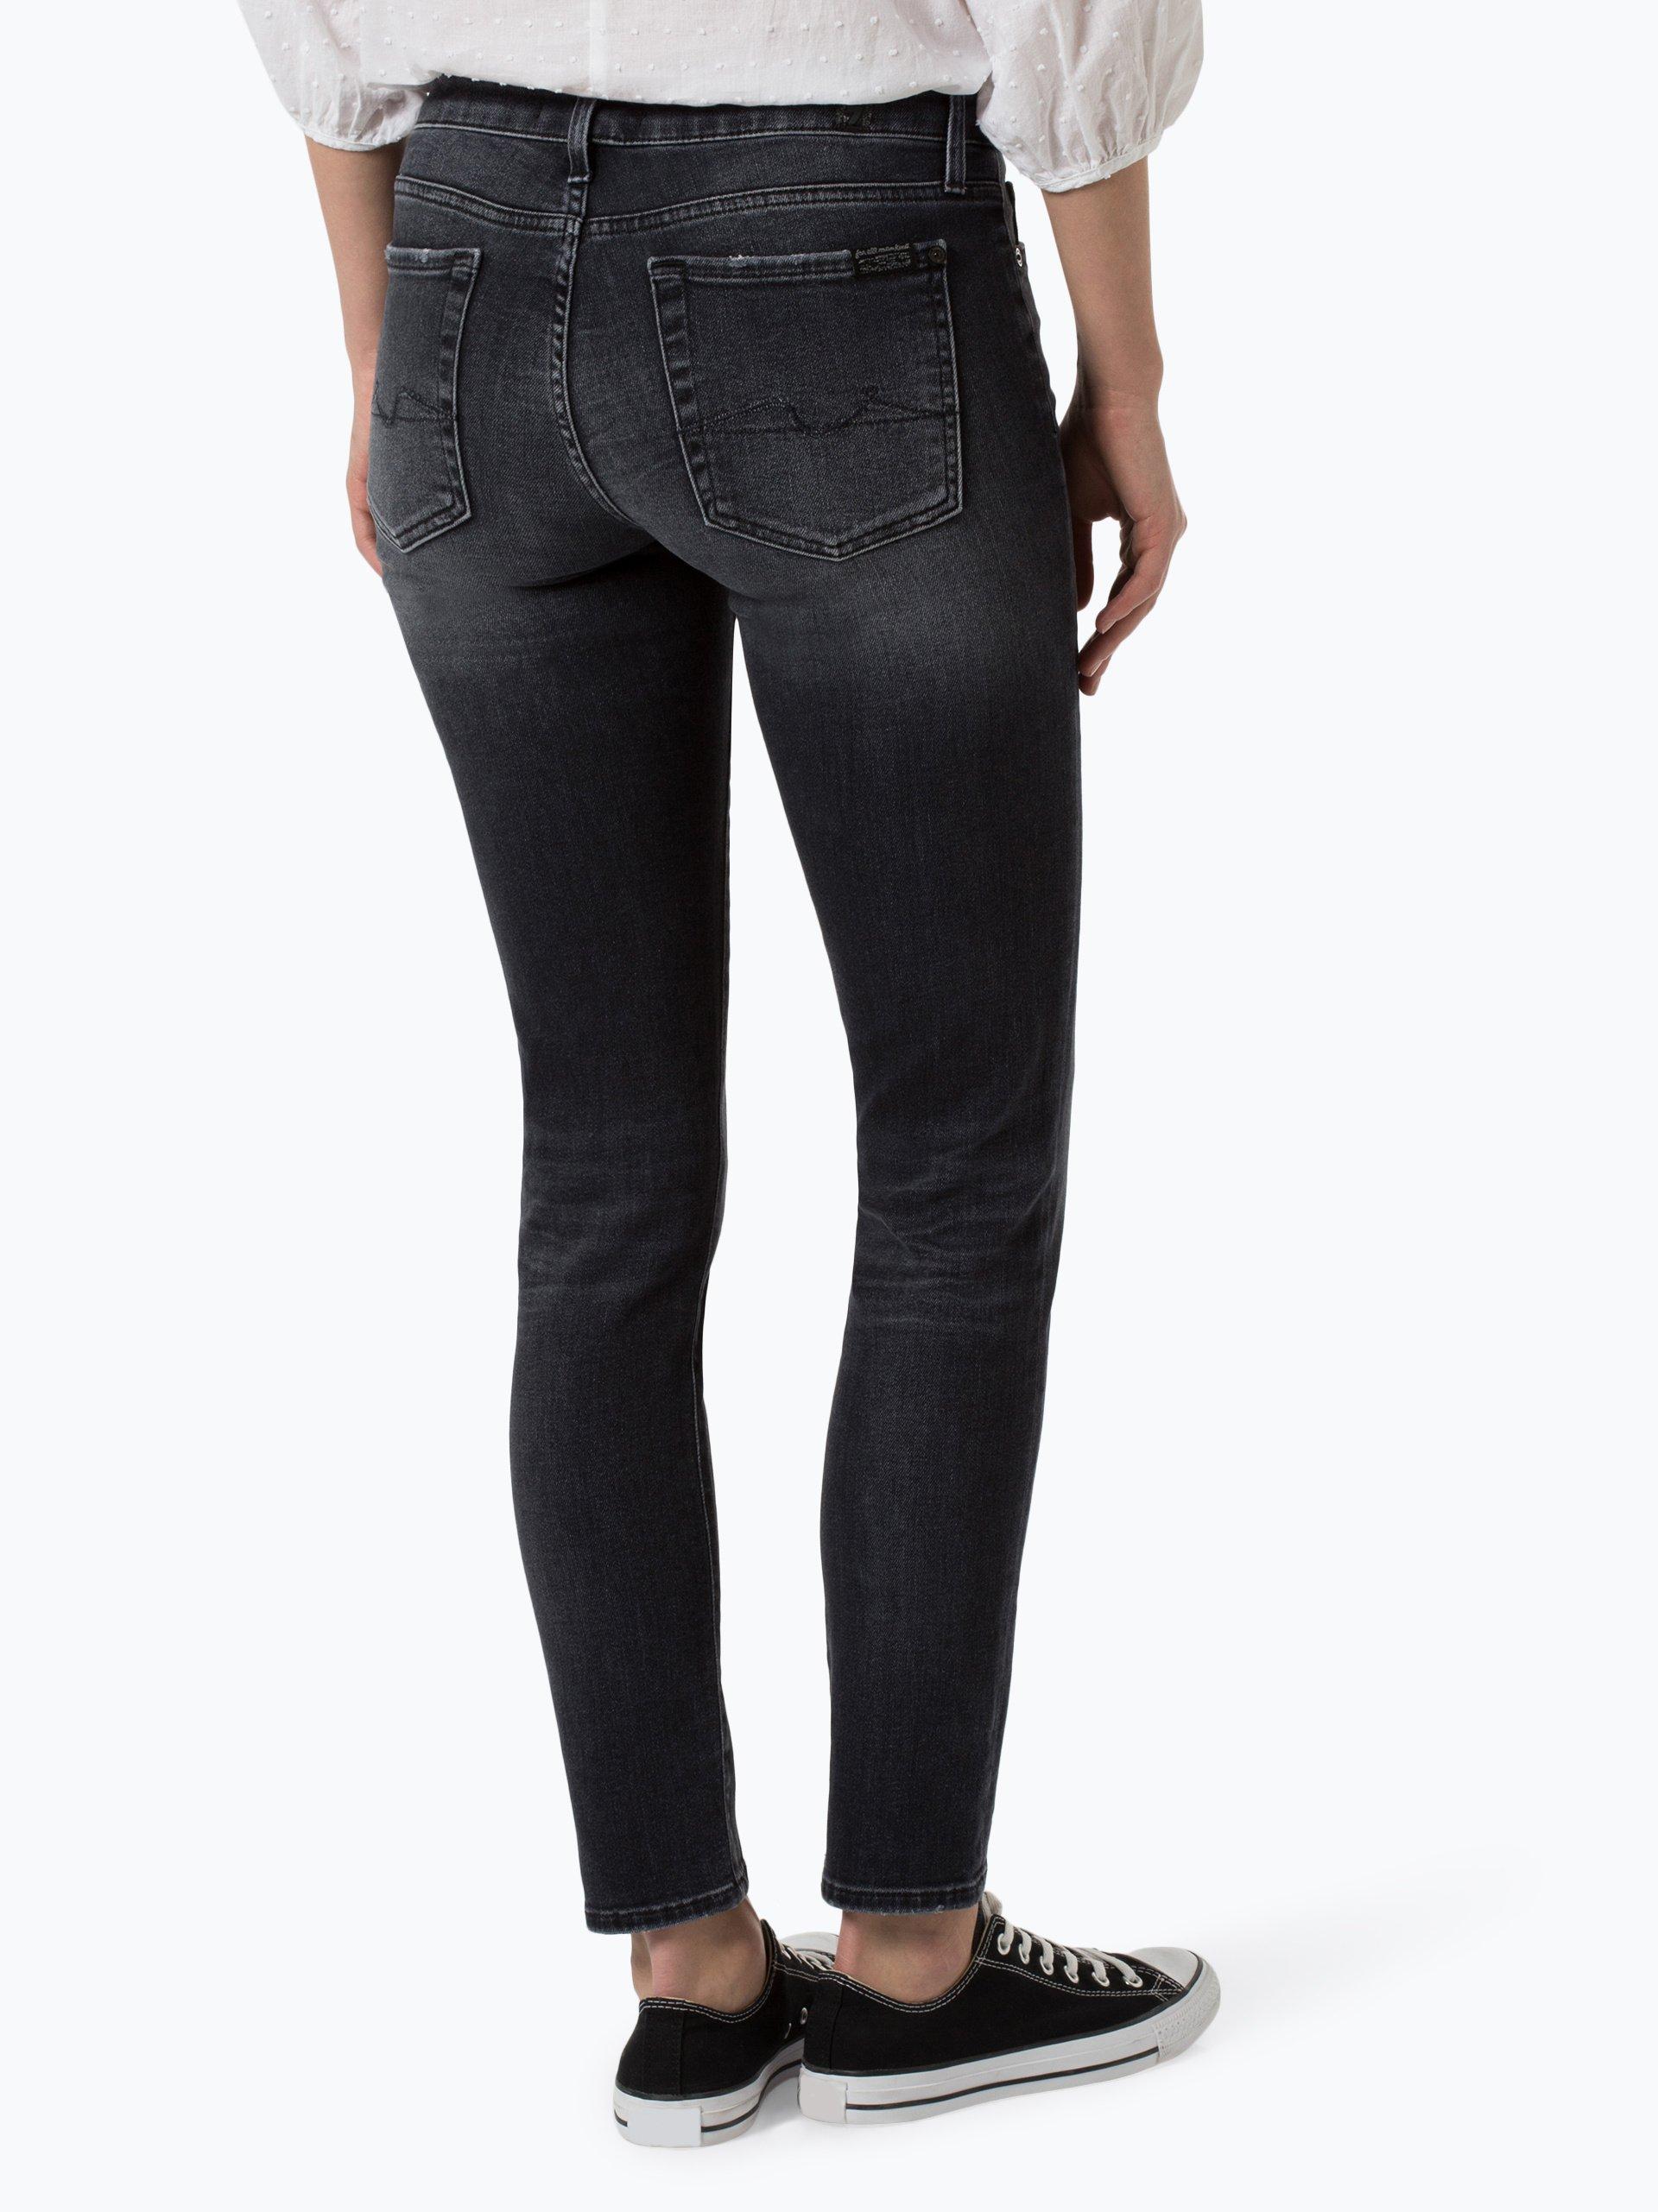 7 For All Mankind Damen Jeans - Pyper Crop